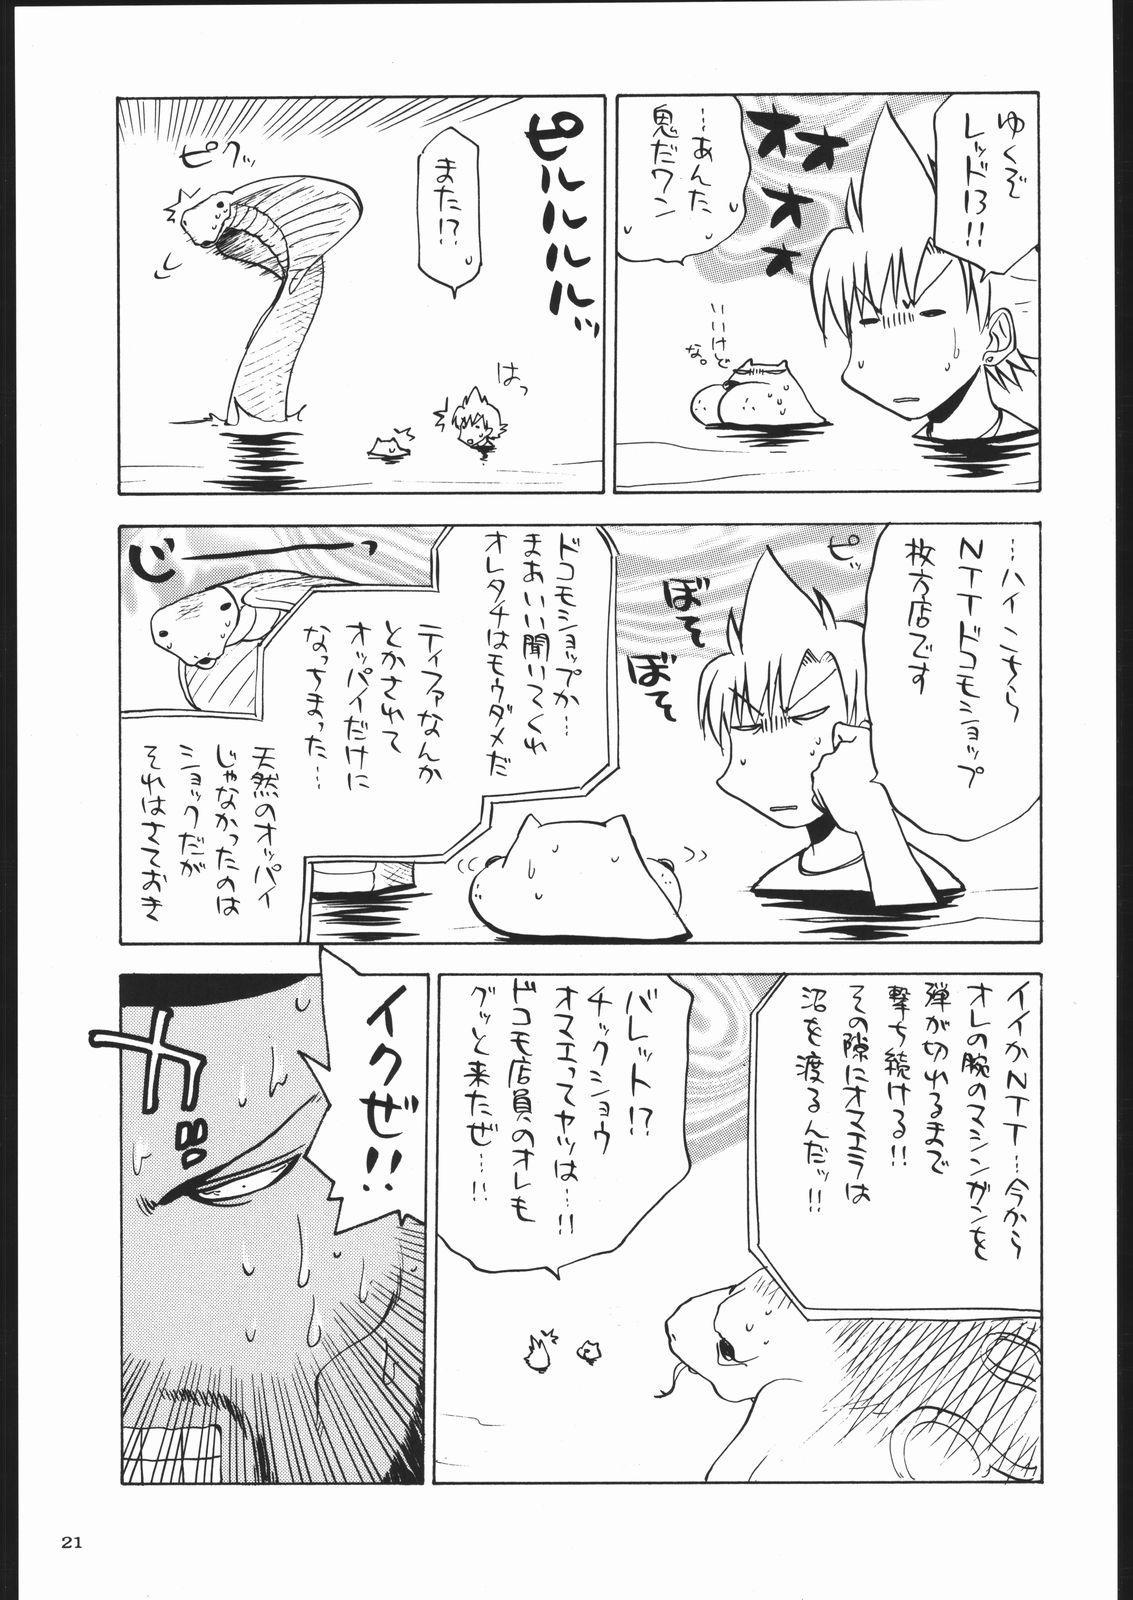 Adachi Misemono Club 19